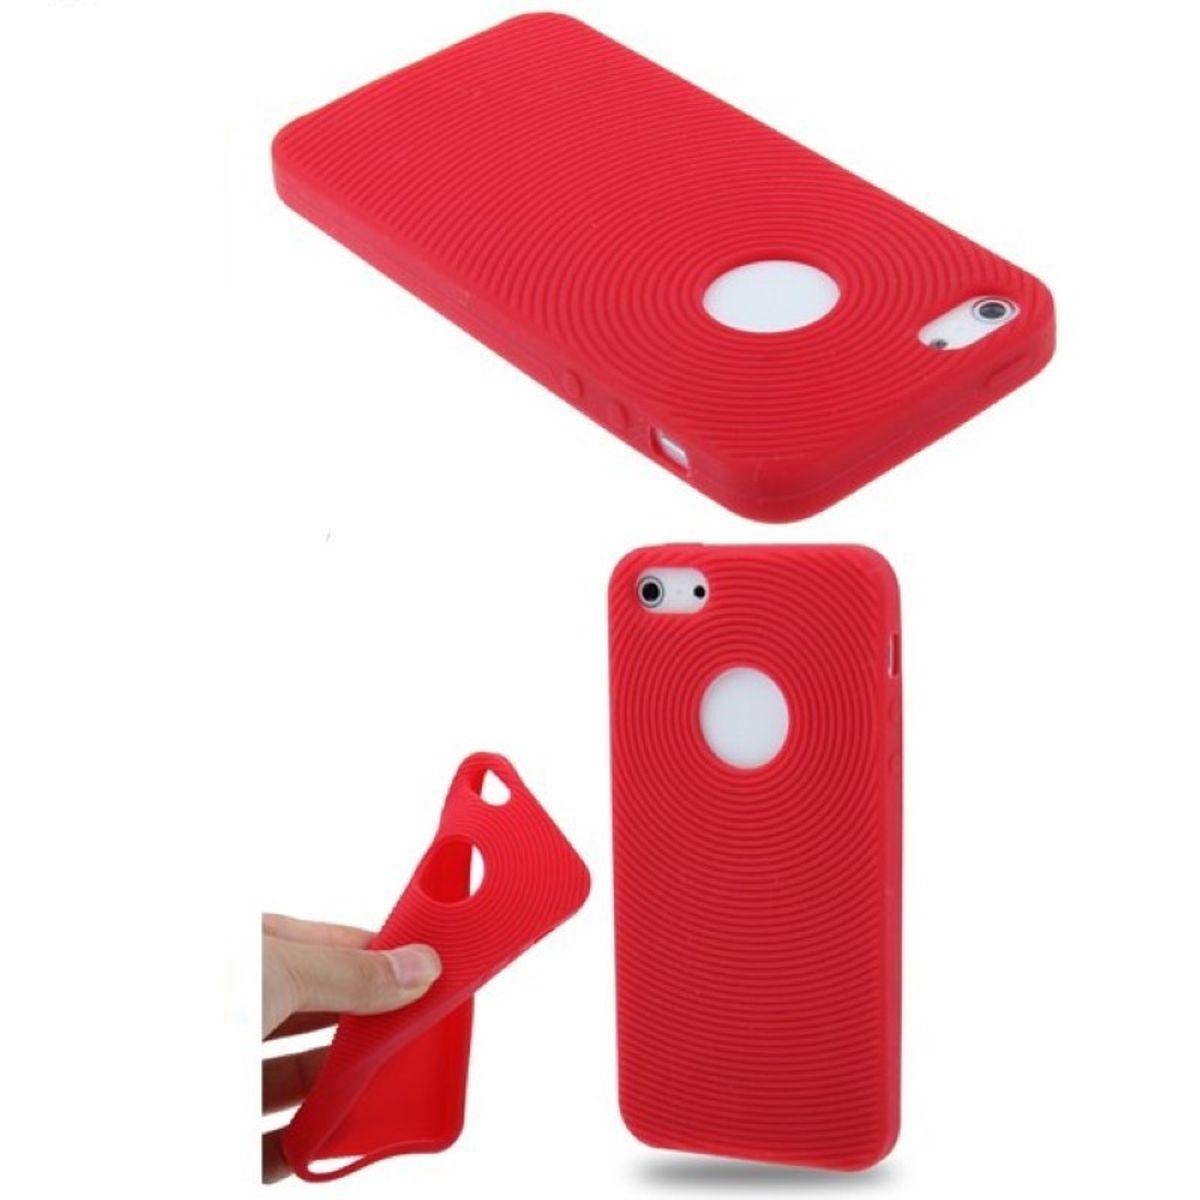 Schutzhülle Silikon Hülle für Handy iPhone 5 / 5s Rot